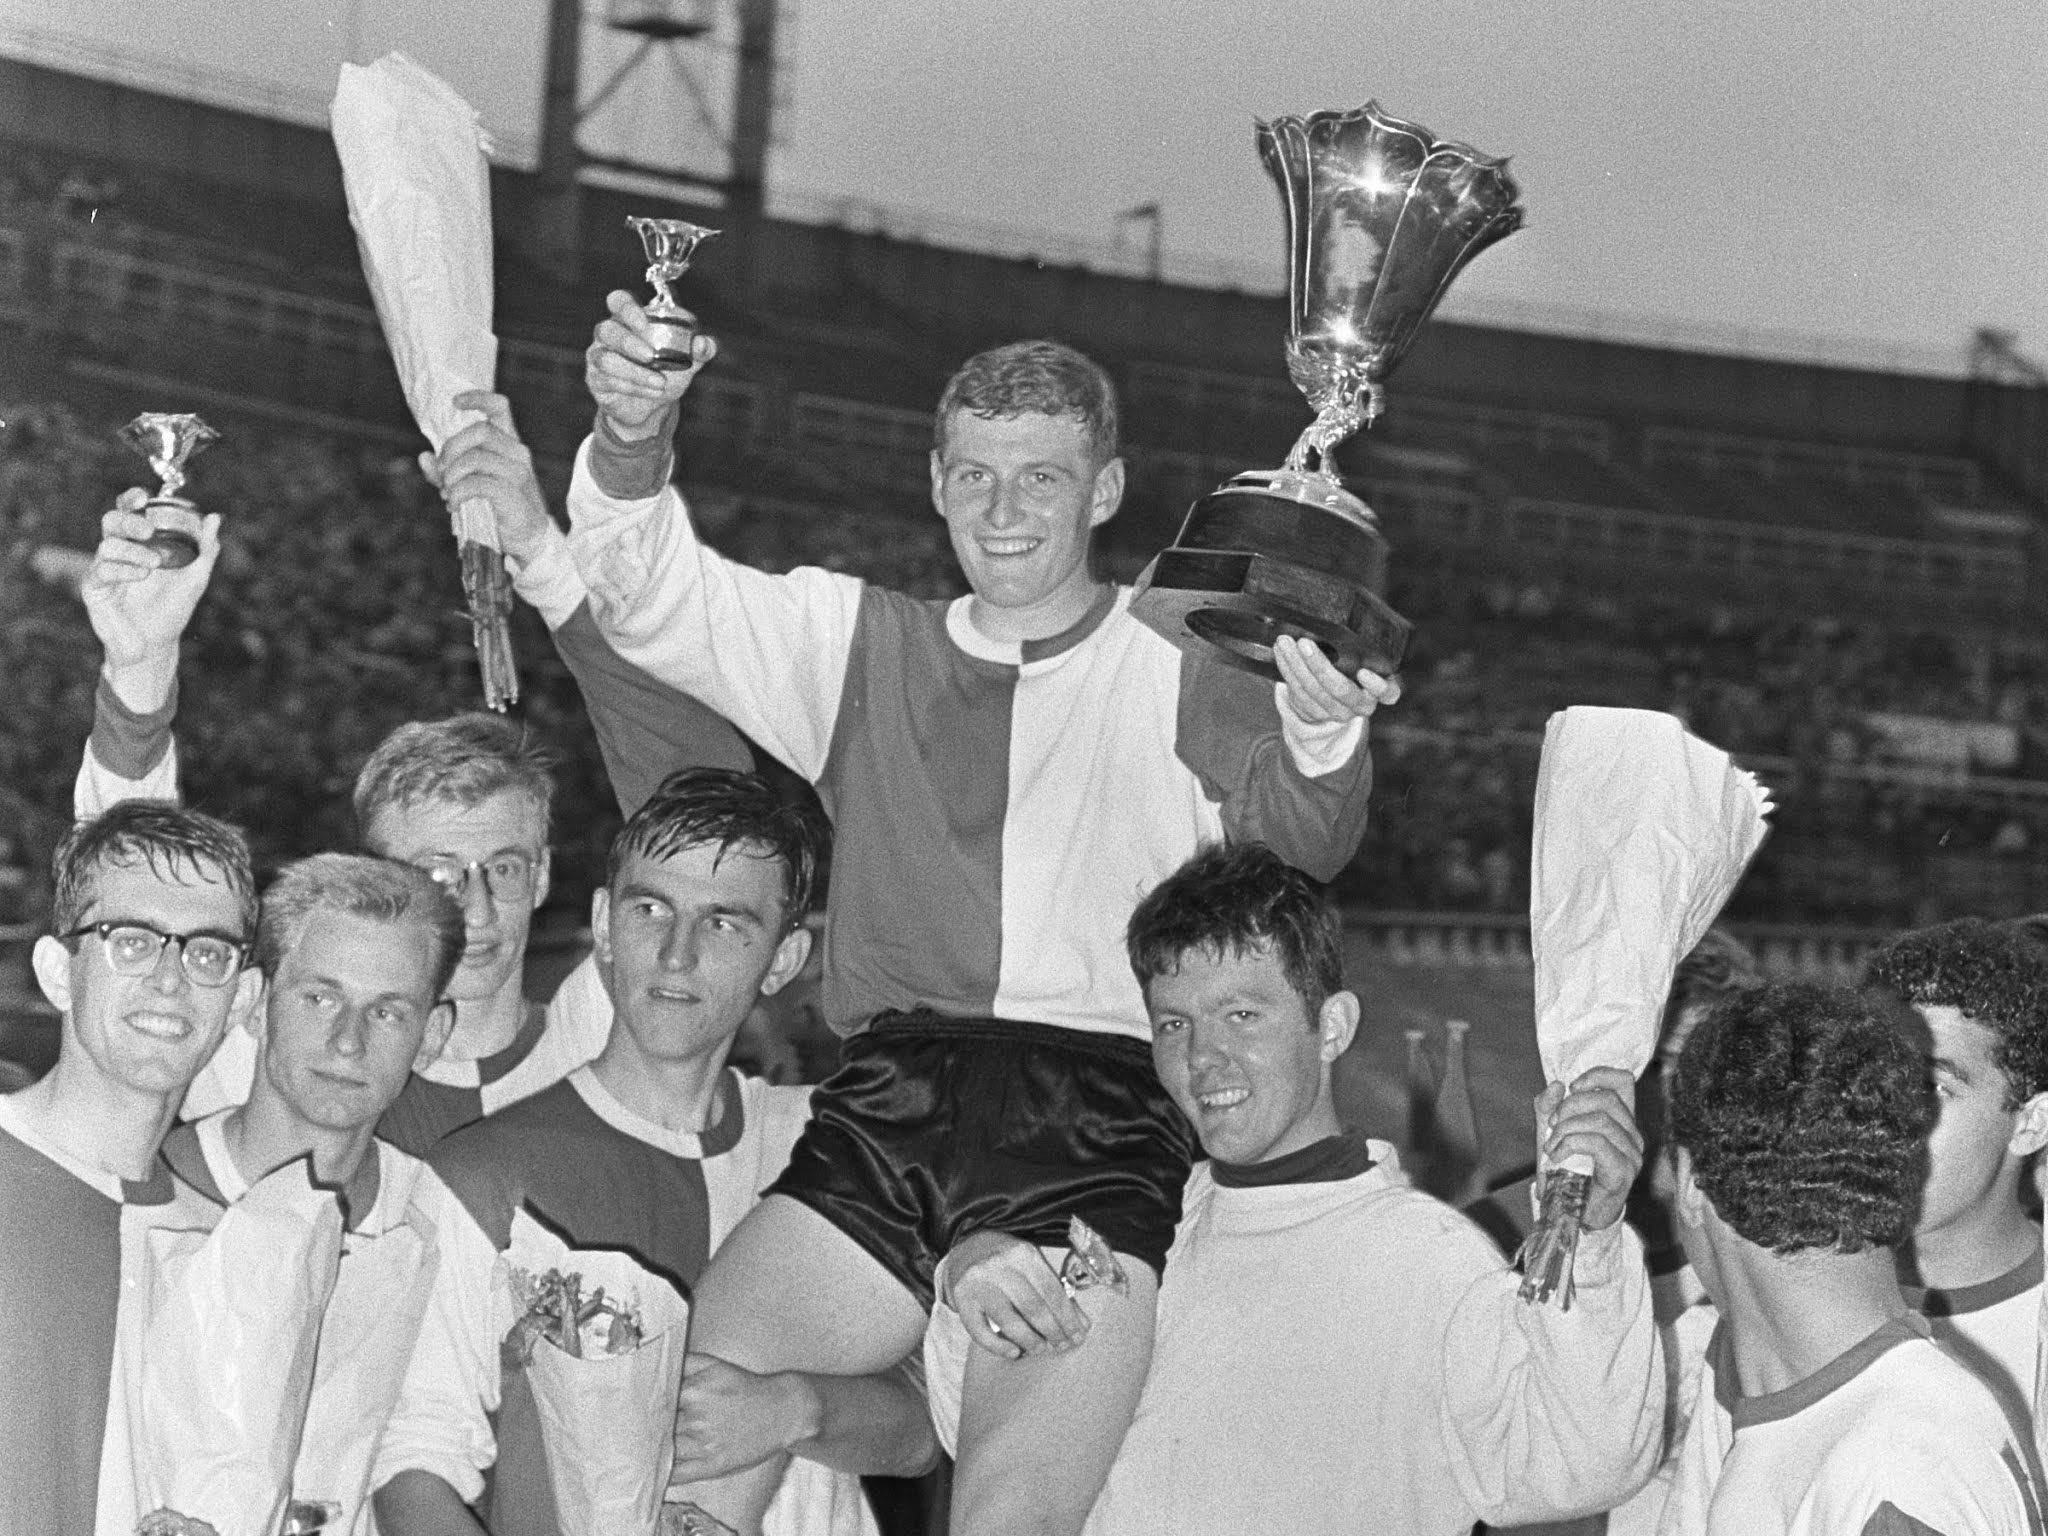 Wim Jansen wint in 1966 de landstitel met de Feyenoordjeugd